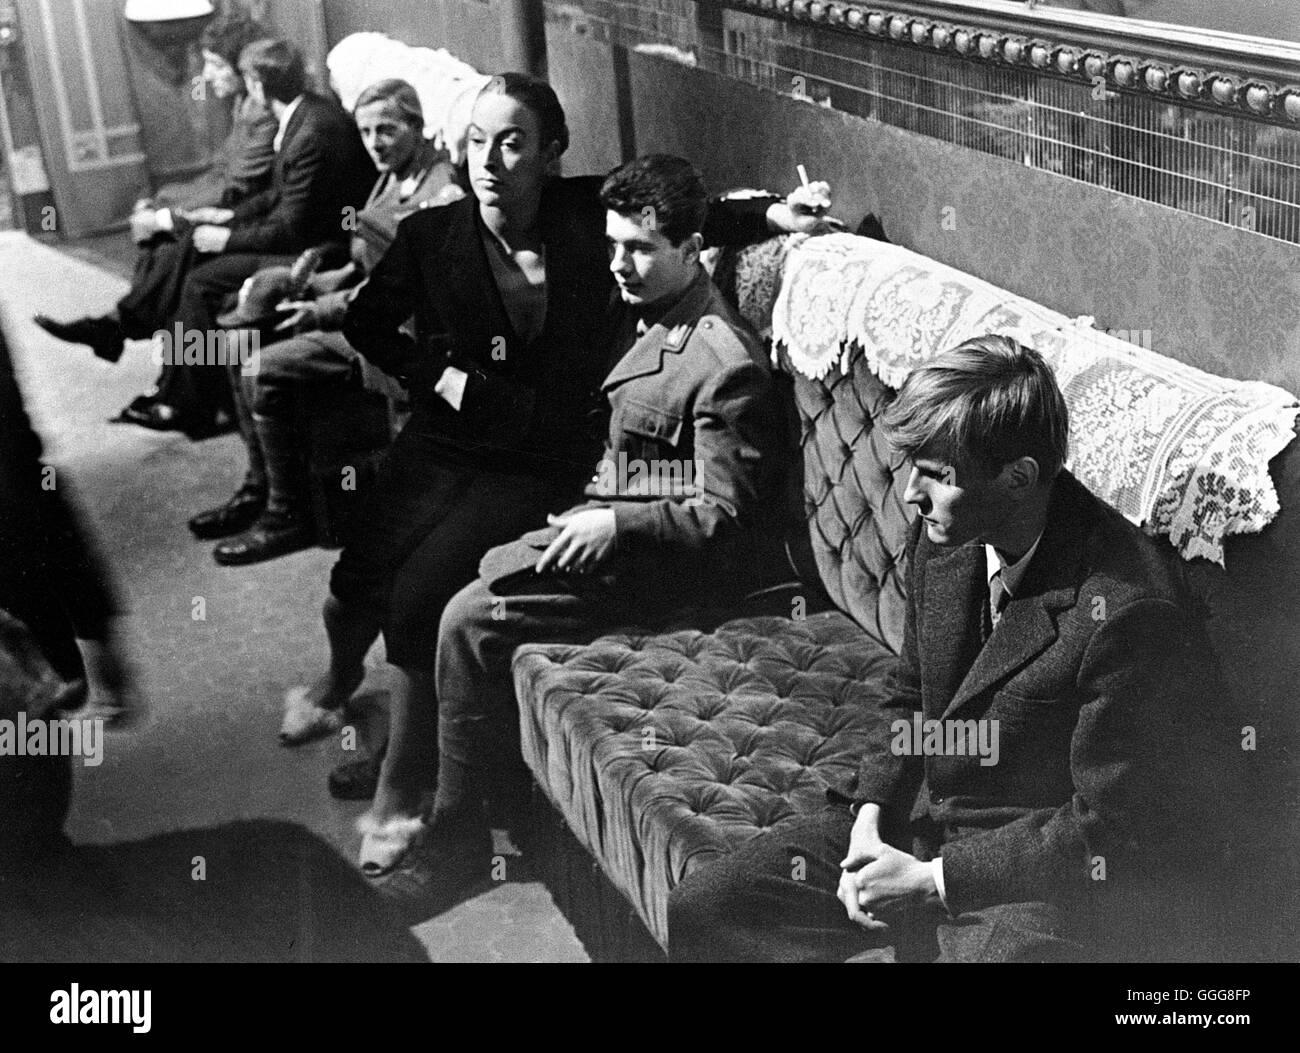 TAGEBUCH EINES SÜNDERS (GEHEIMES TAGEBUCH) / Cronaca familiare Italien 1962 / Valerio Zurlini Szene mit JACQUES Stock Photo